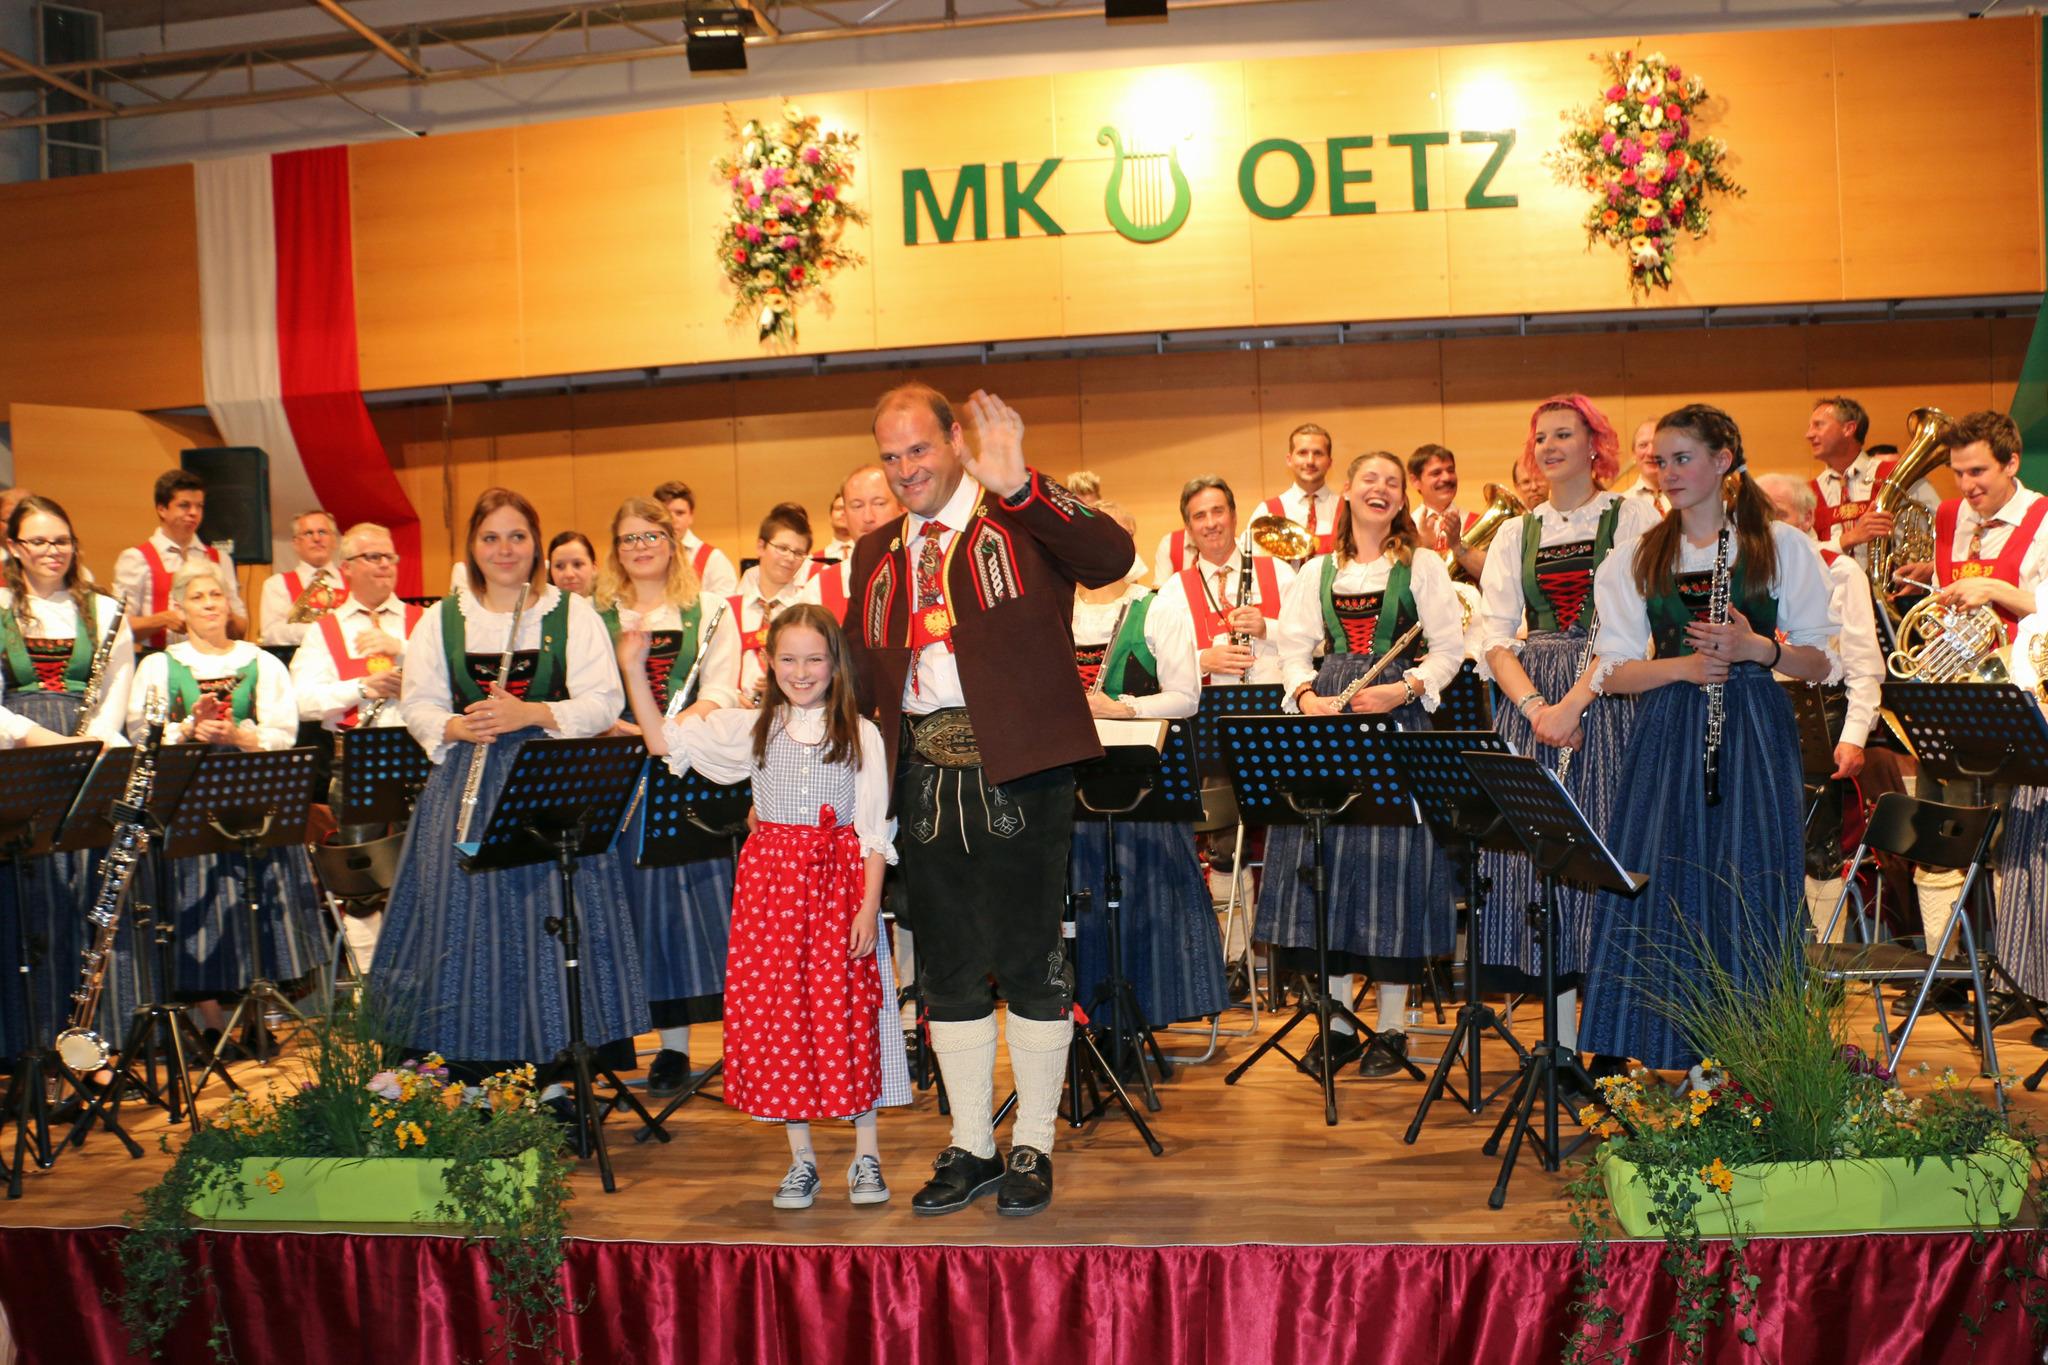 Oetz in Tirol - Thema auf carolinavolksfolks.com